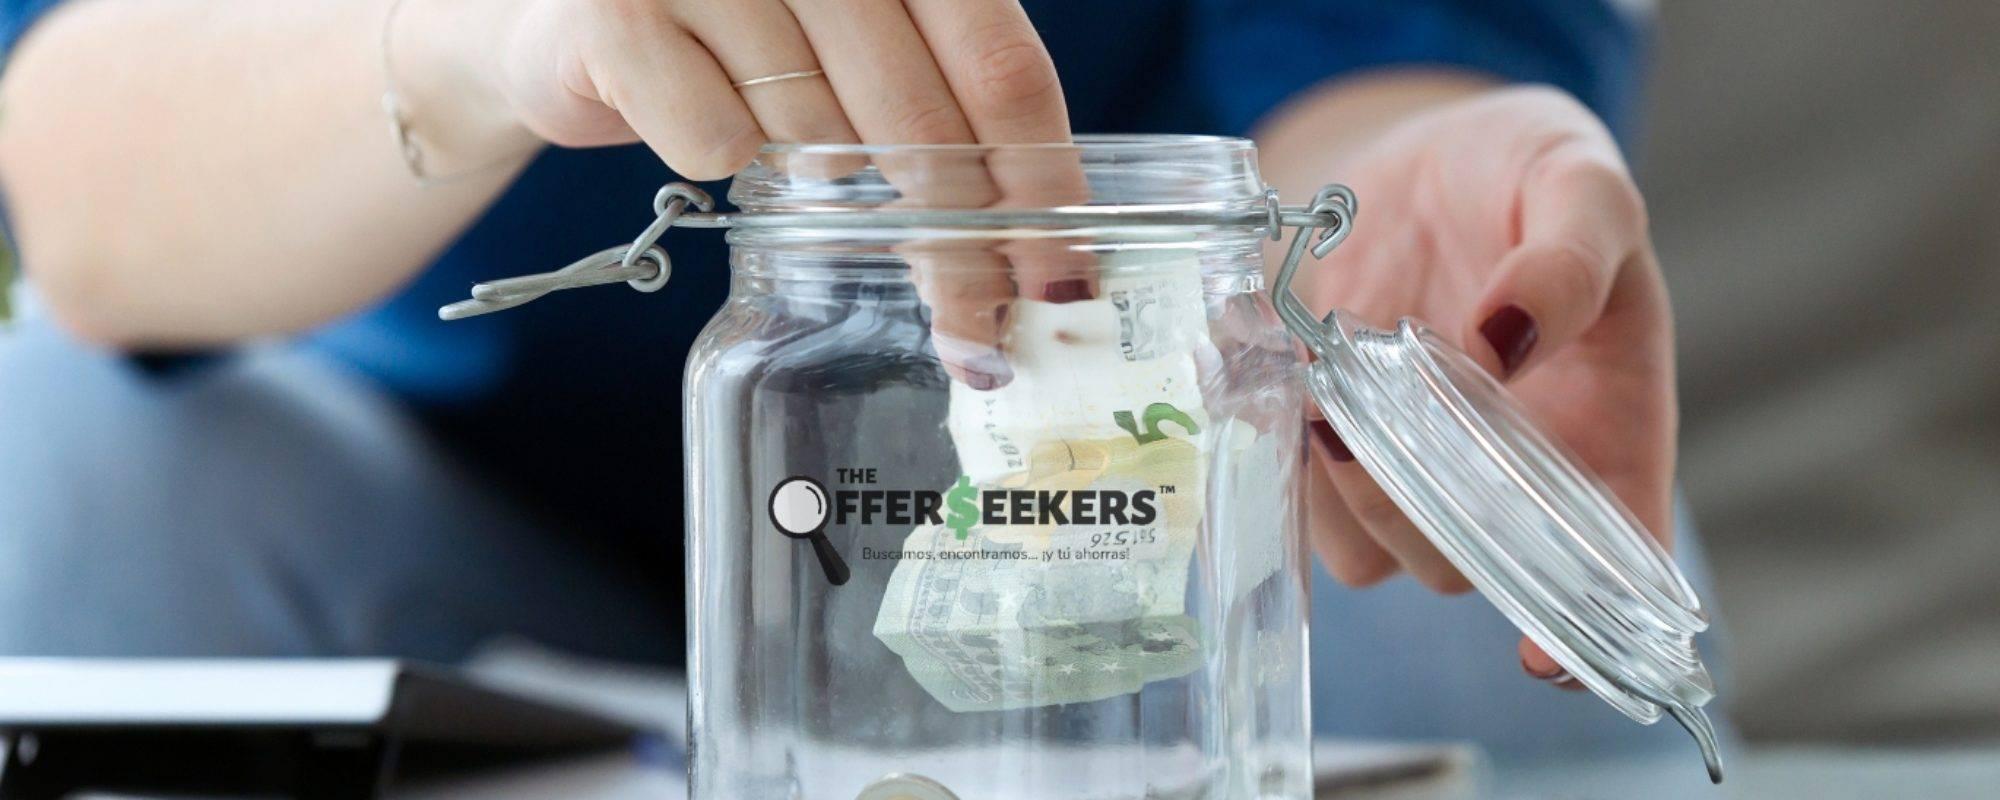 Las mejores franquicias de internet económicas - THE OFFER SEEKERS